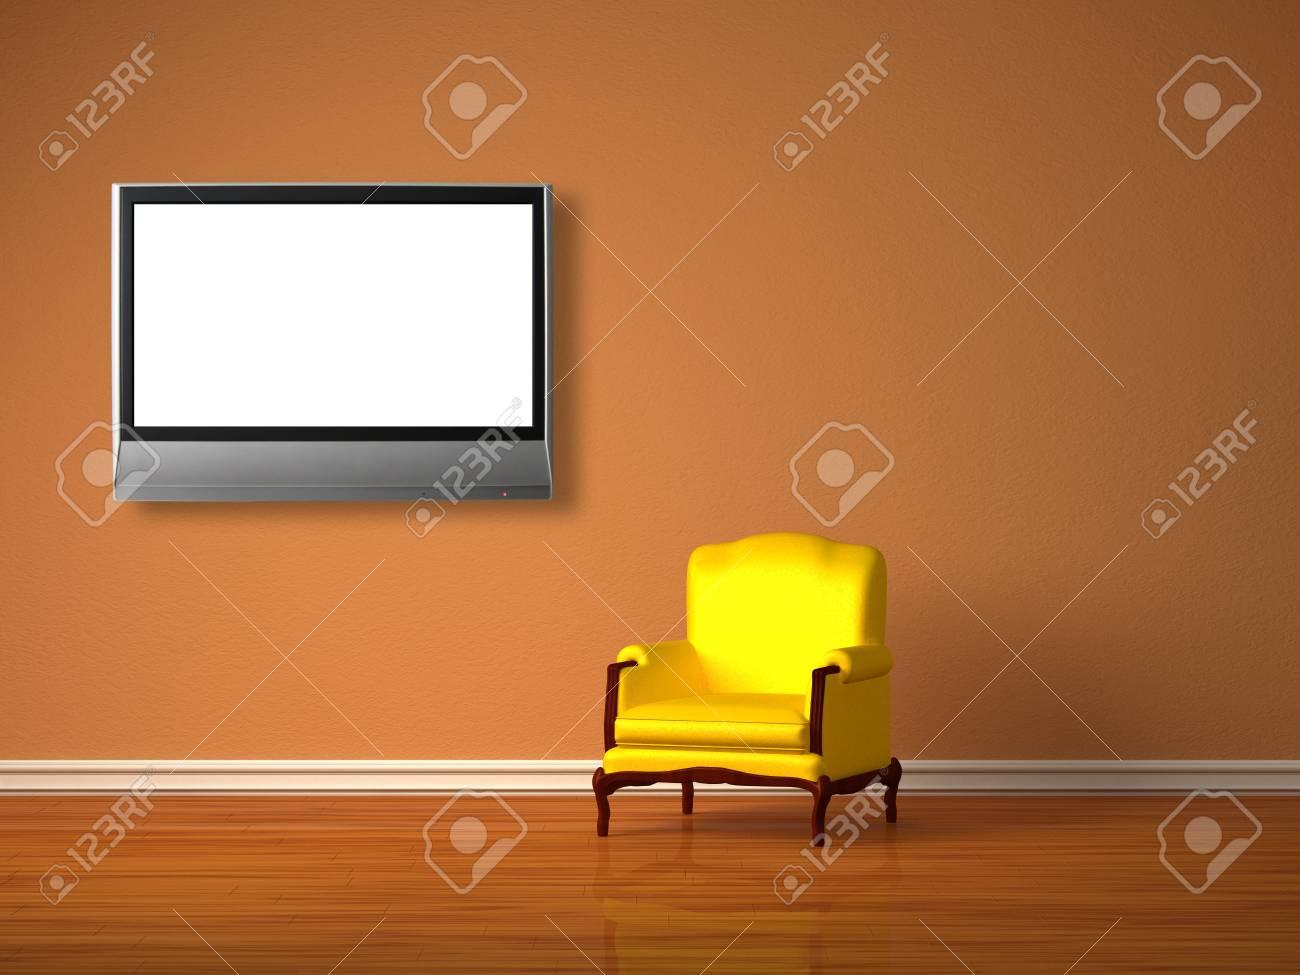 Alone luxurious chair in minimalist interior Stock Photo - 13138559